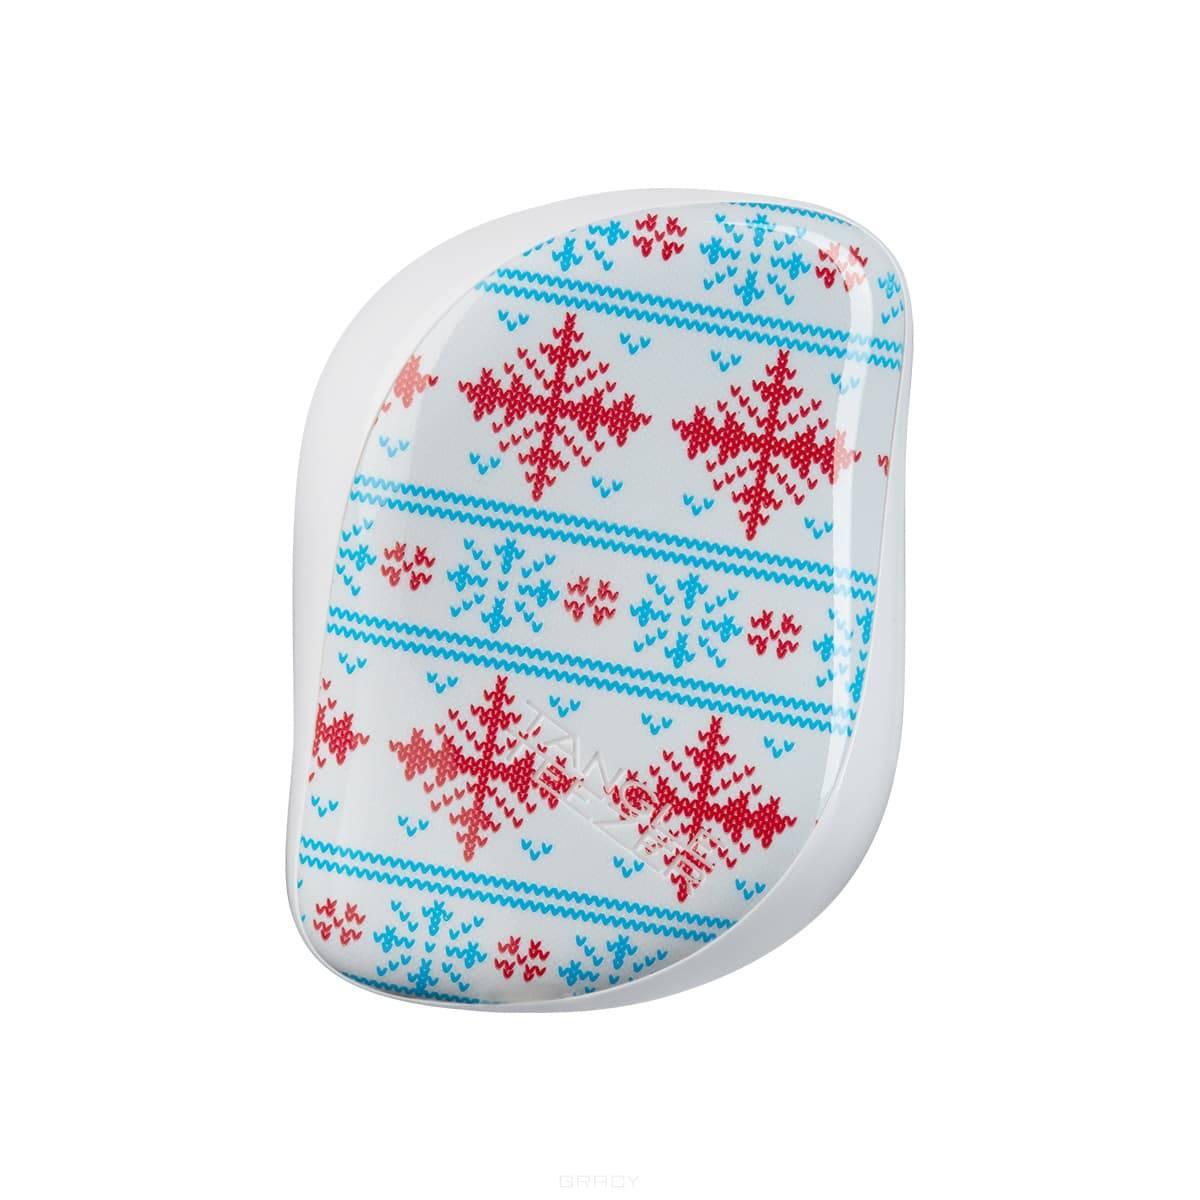 Tangle Teezer Расческа для волос Compact Styler Winter Frost , Расческа для волос Compact Styler Winter Frost, 1 шт недорого